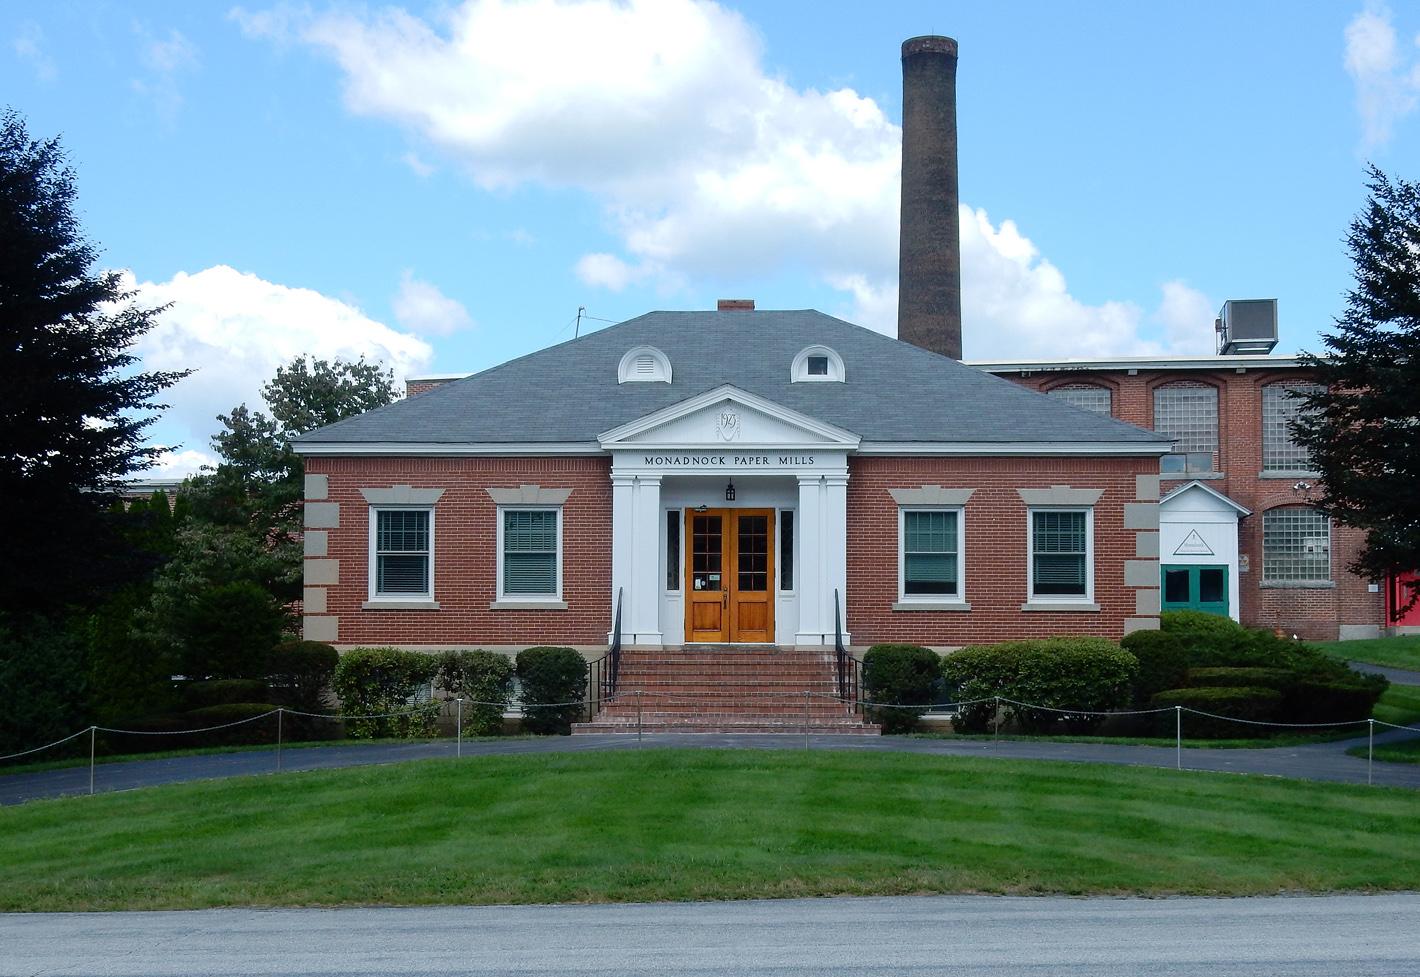 Monadnock Paper Mills. Bennington, New Hampshire